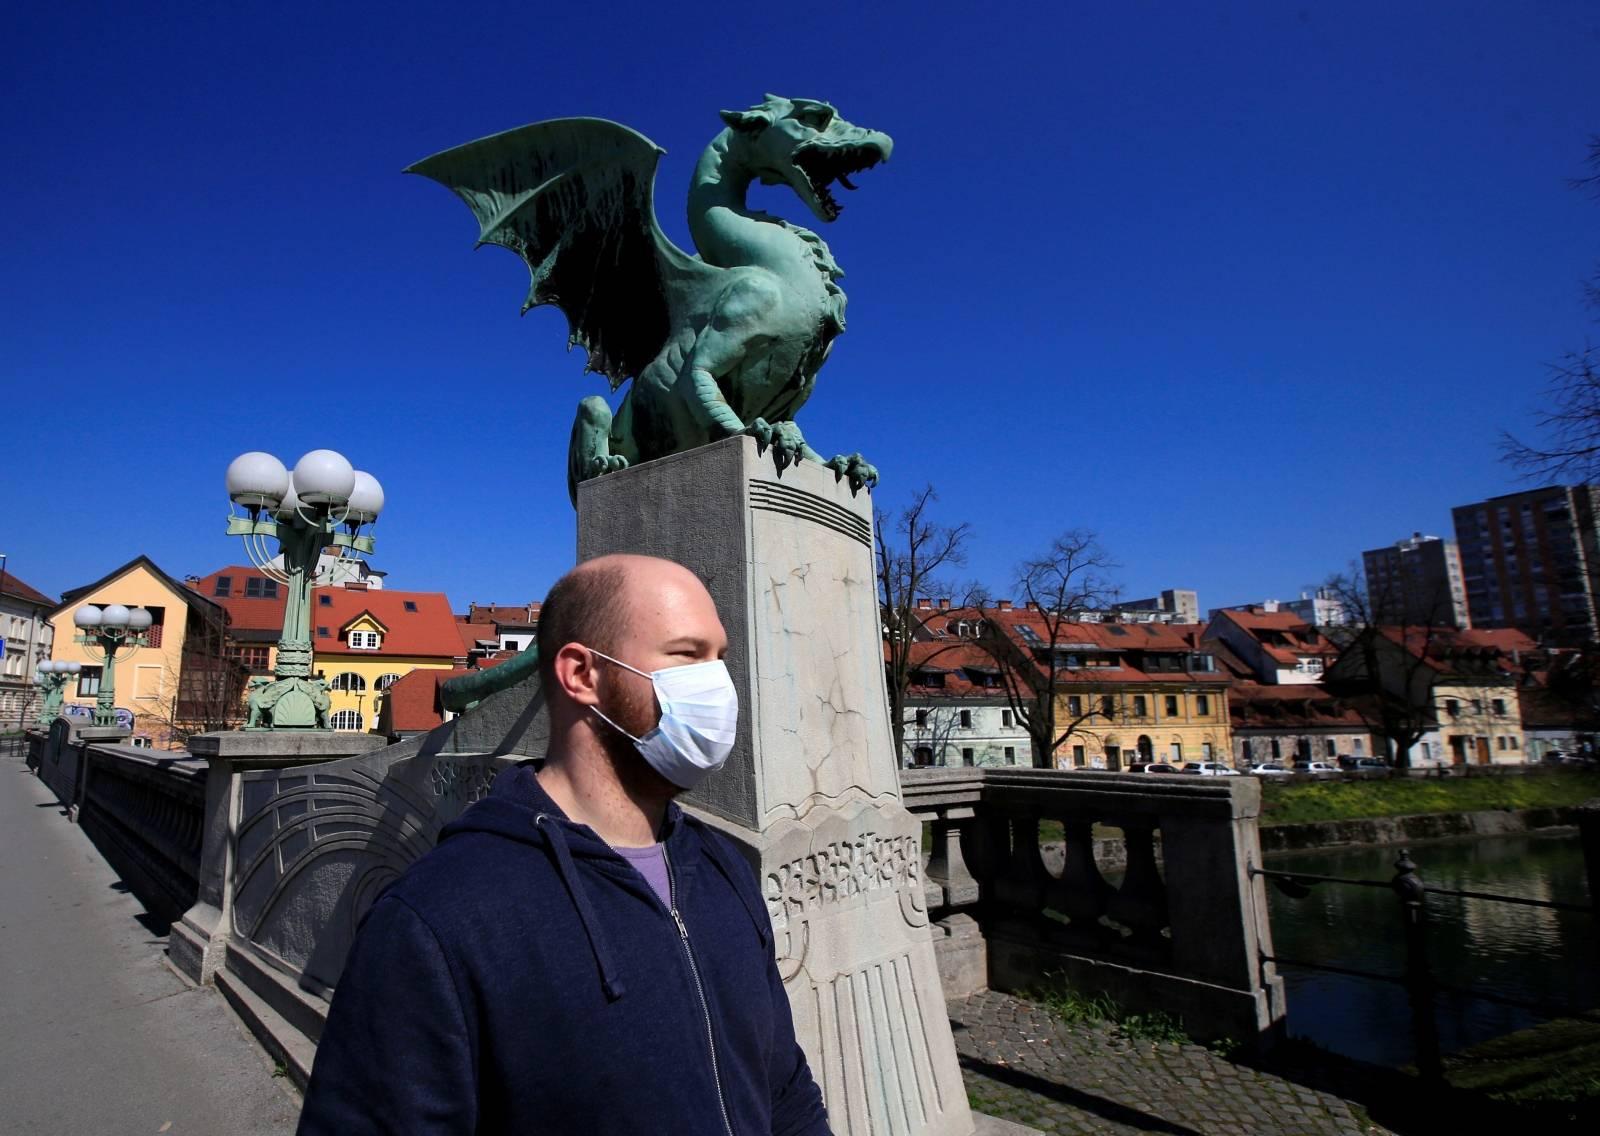 FILE PHOTO: A man with a face mask walks on the Dragon's bridge during coronavirus disease (COVID-19) fears, in Ljubljana